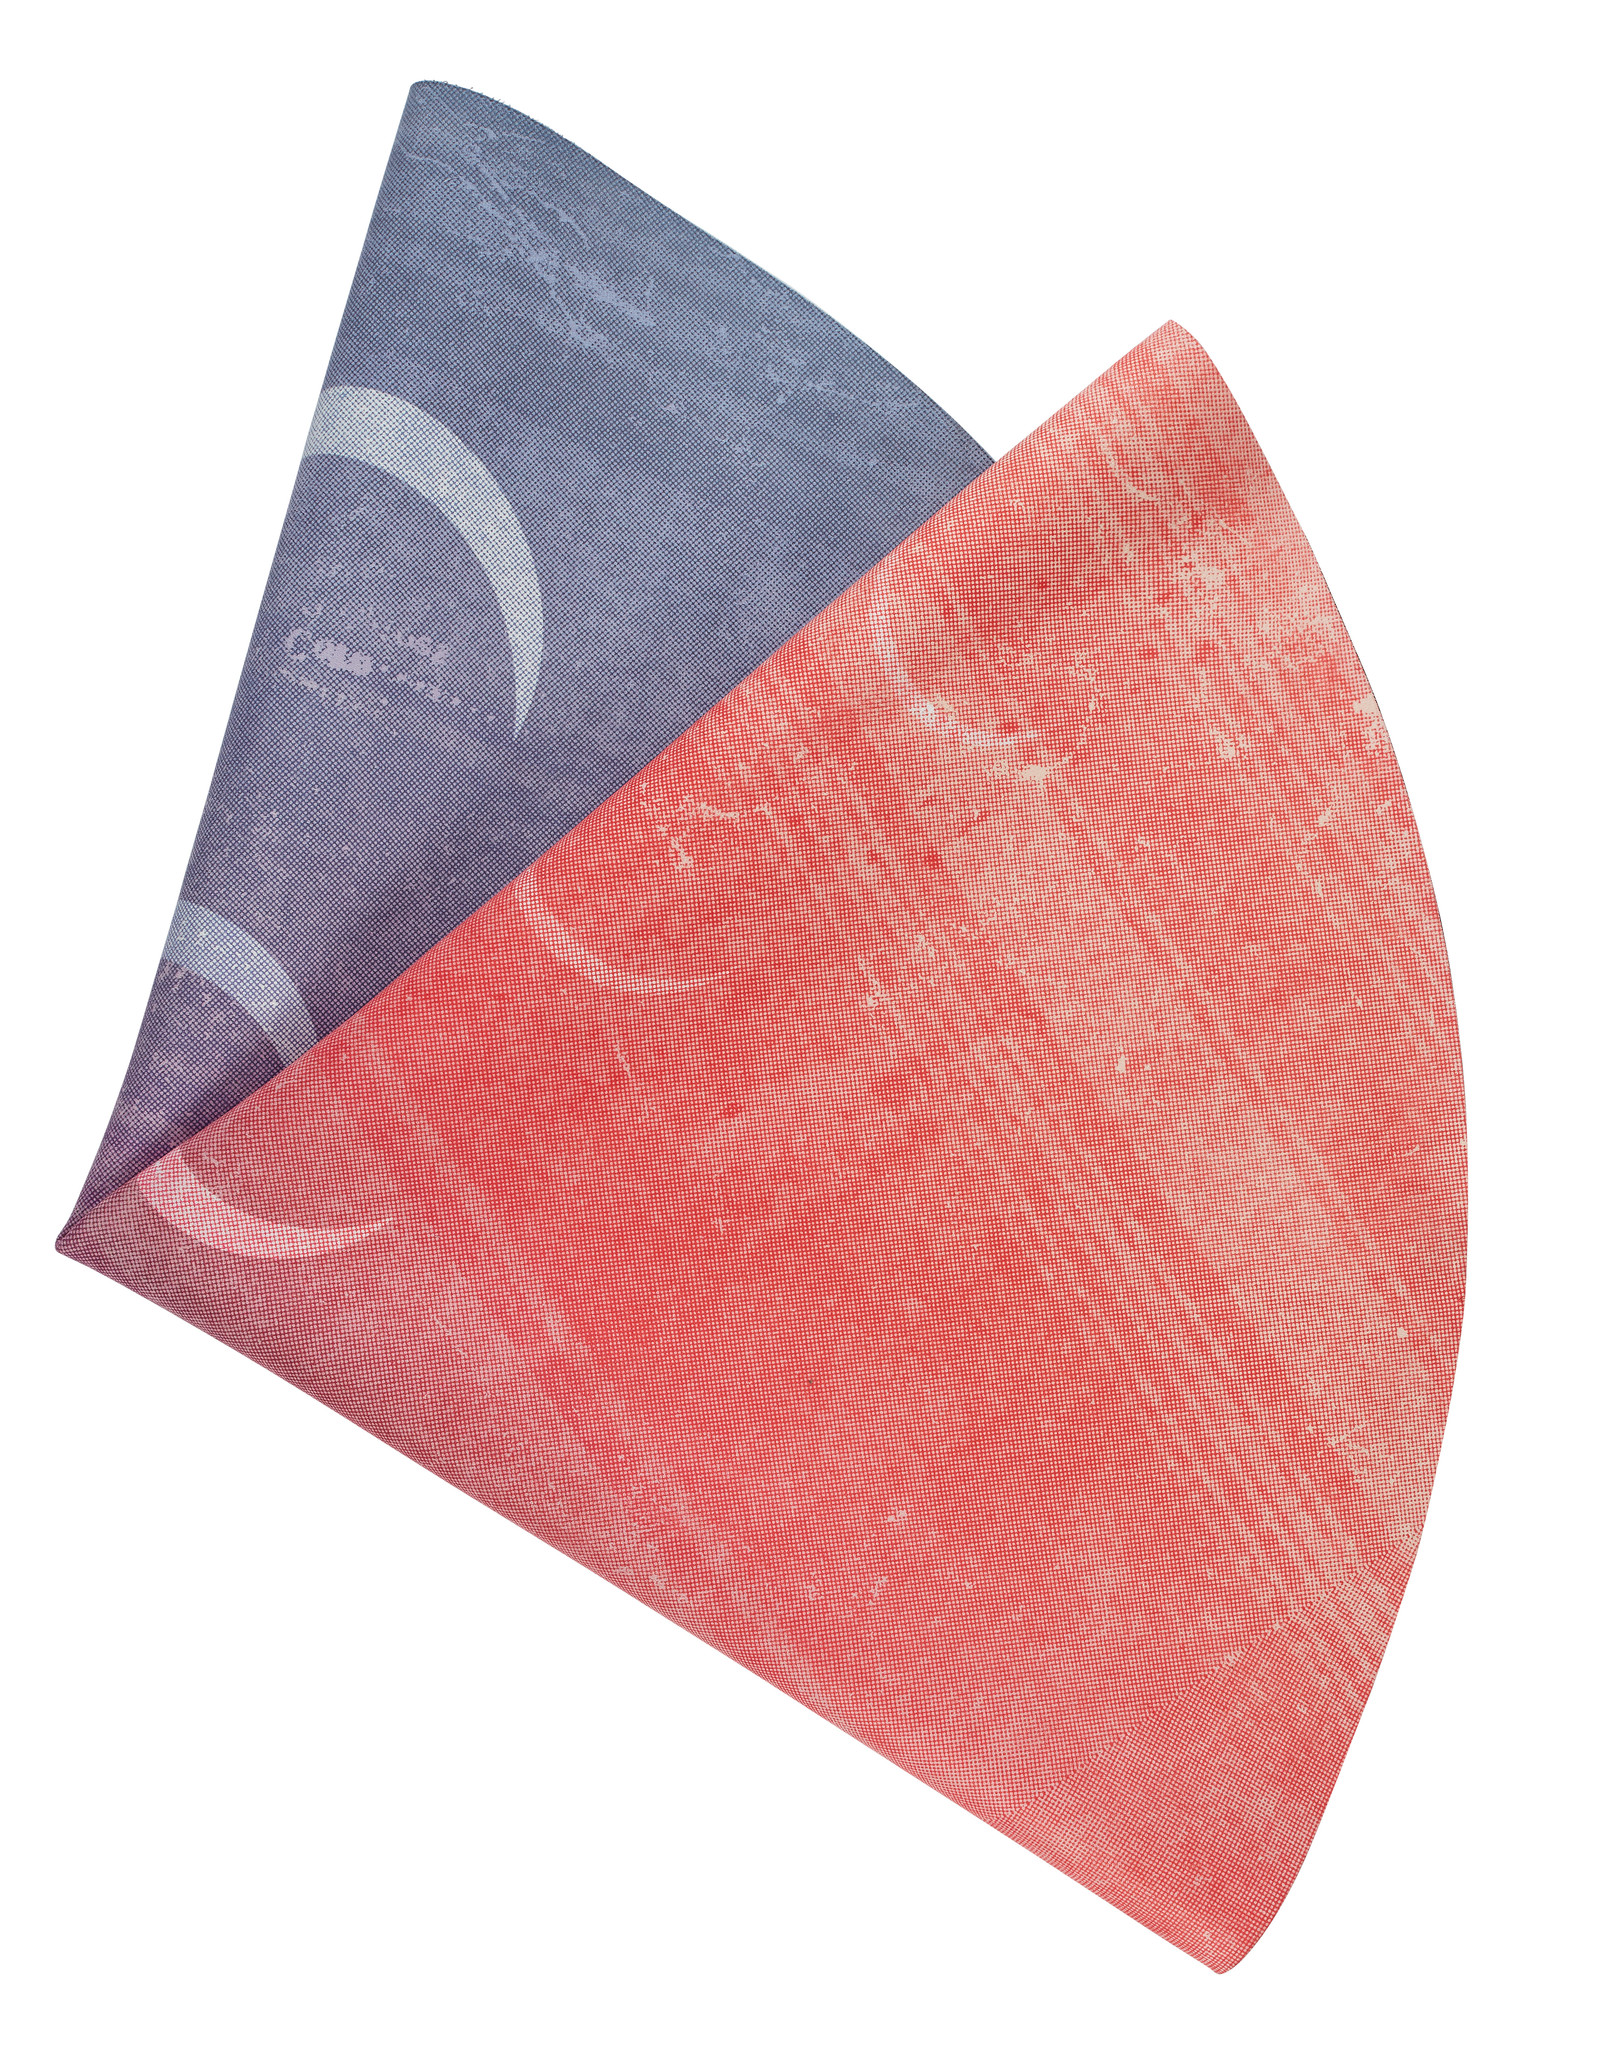 Manduka eQua eKO Round Mat 3mm-150cm-Luna Sunrise